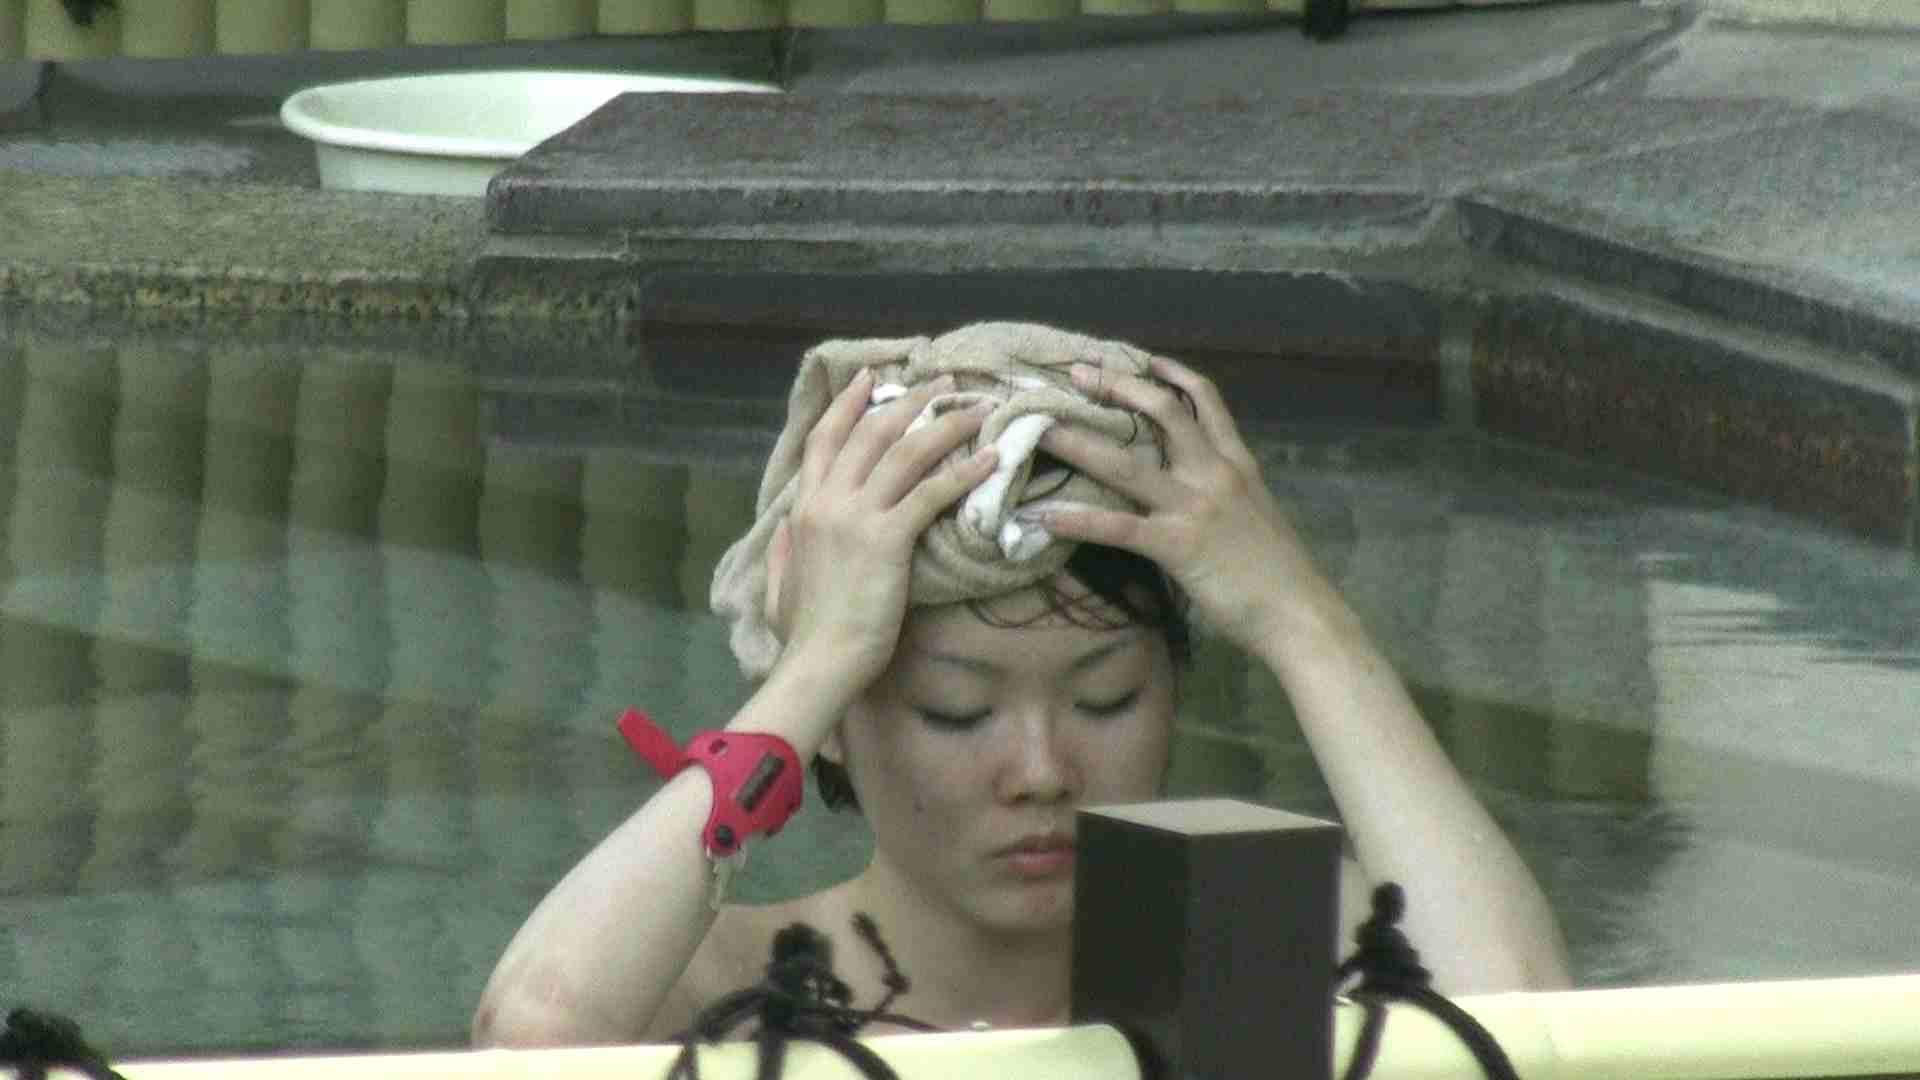 Aquaな露天風呂Vol.191 露天 | OL女体  72連発 31